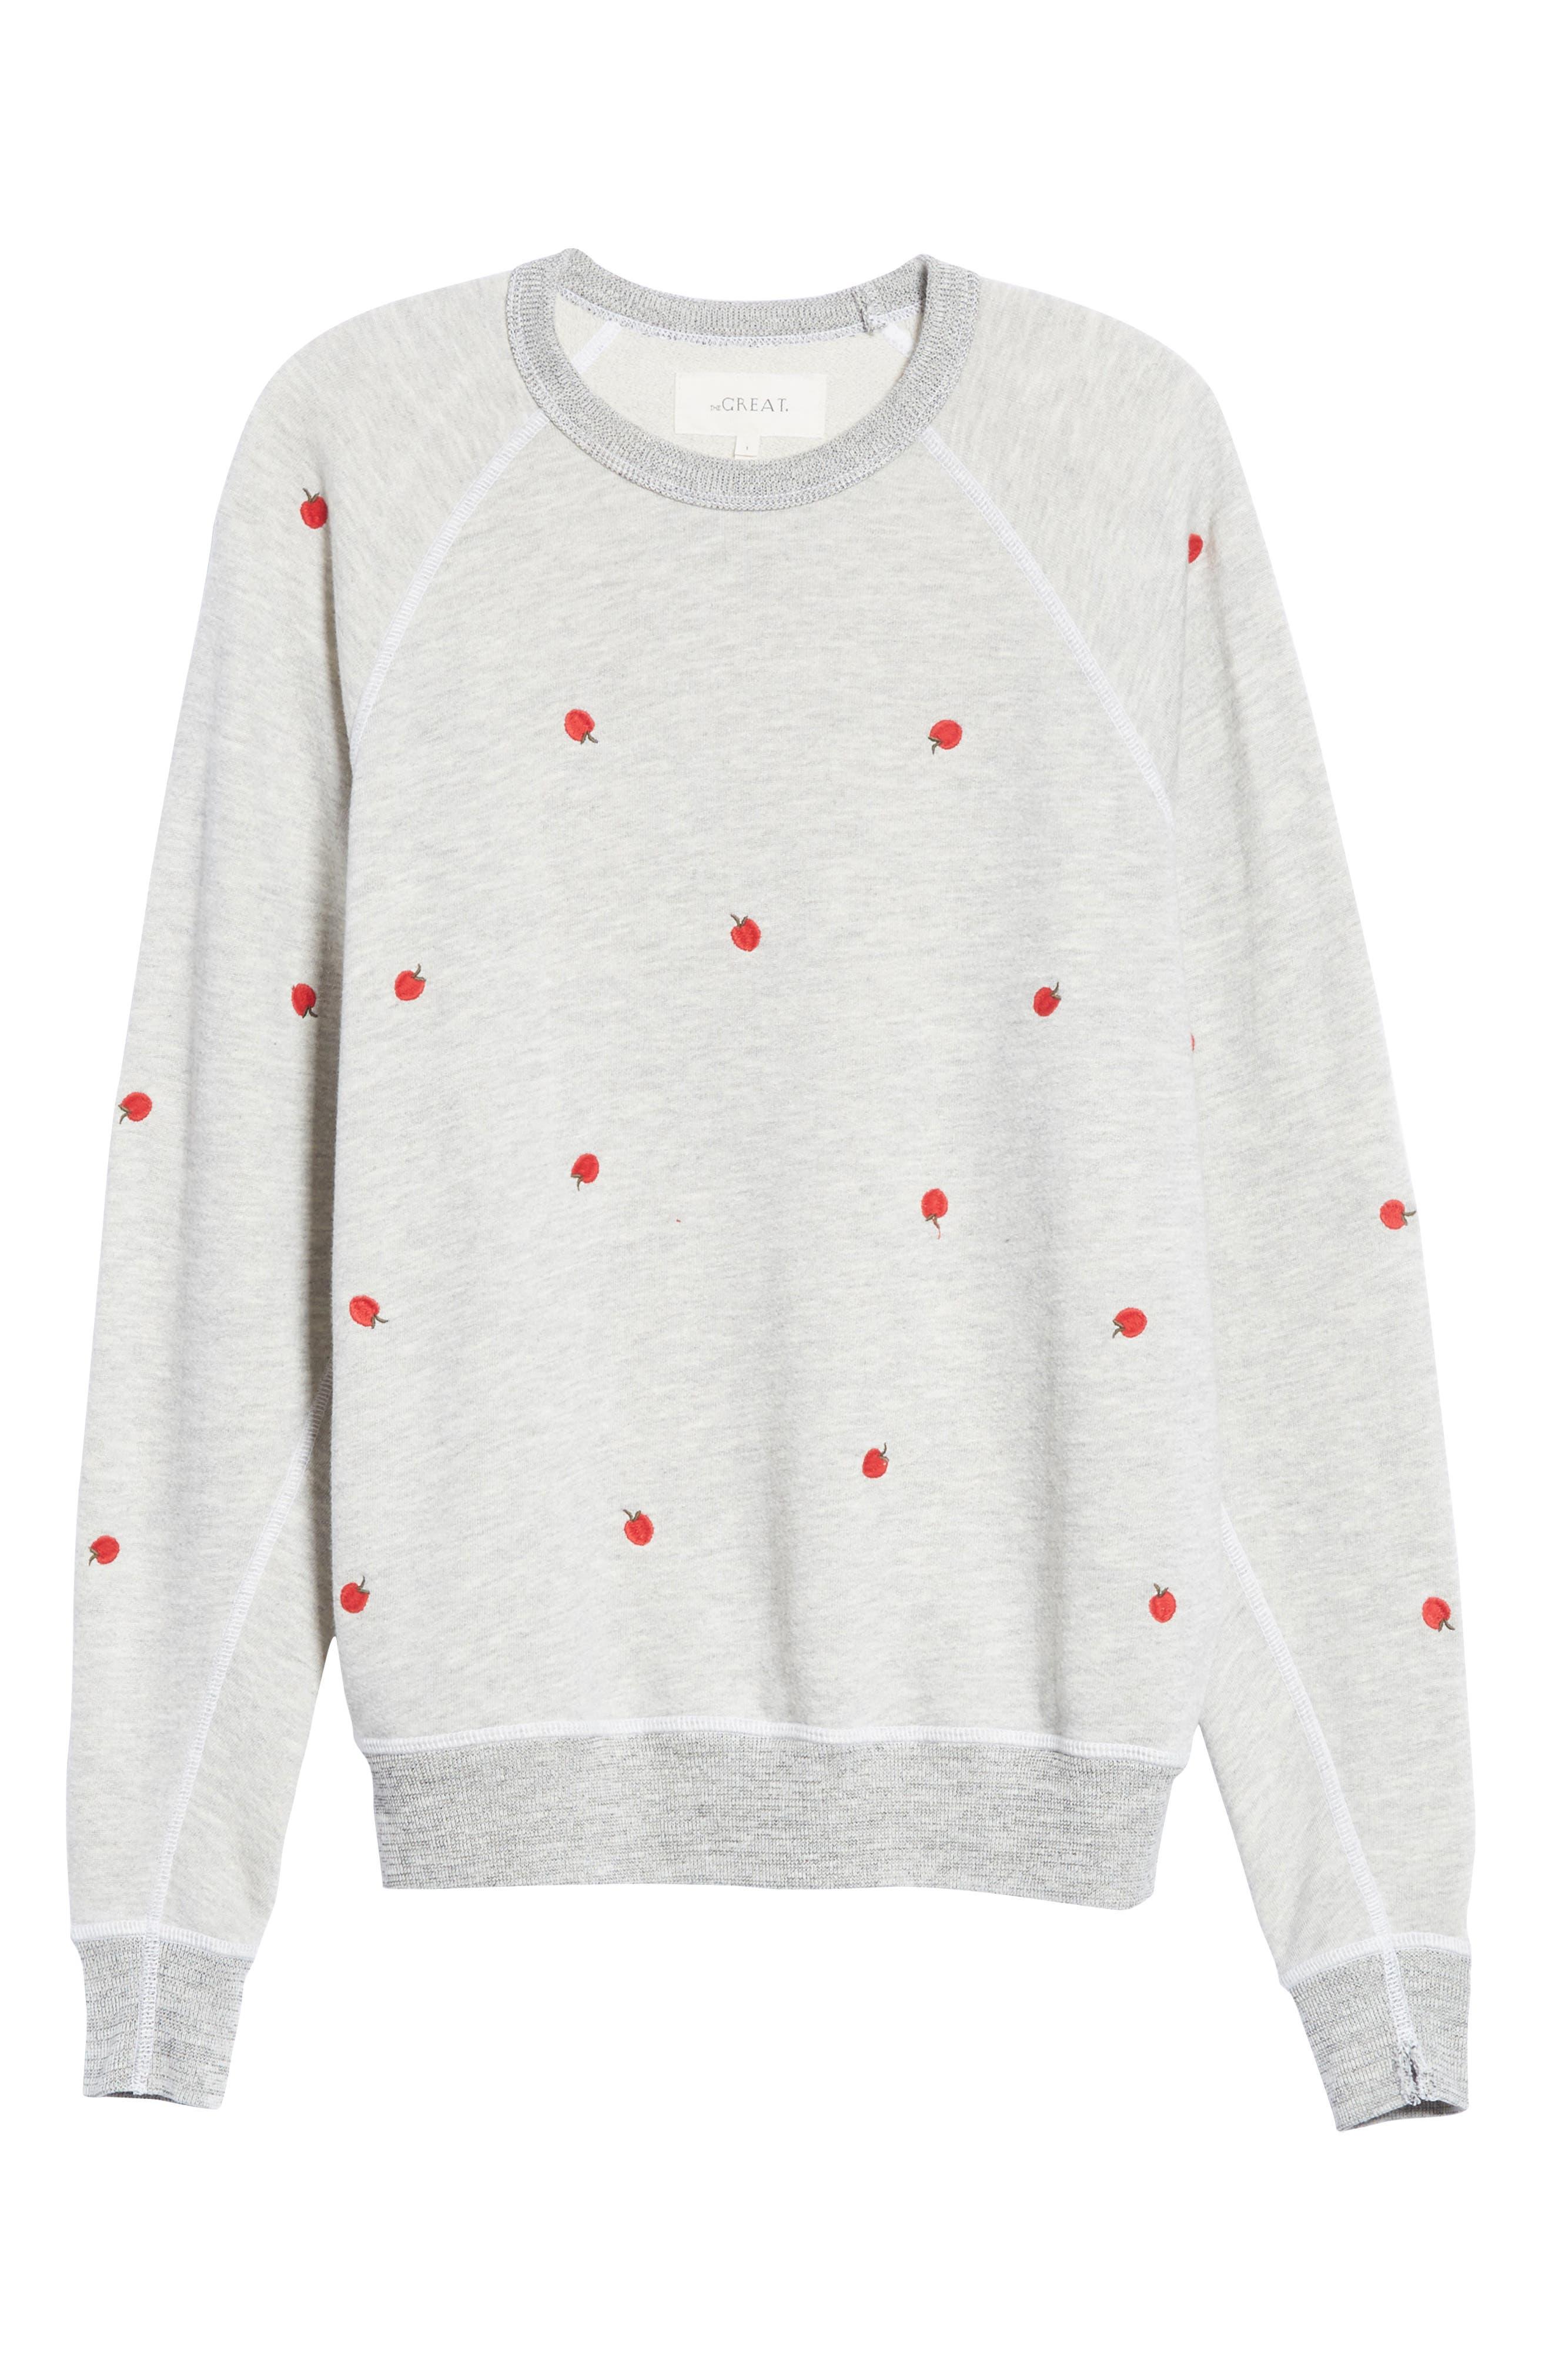 College Sweatshirt,                             Alternate thumbnail 5, color,                             Light Heather Grey/ Red Apples